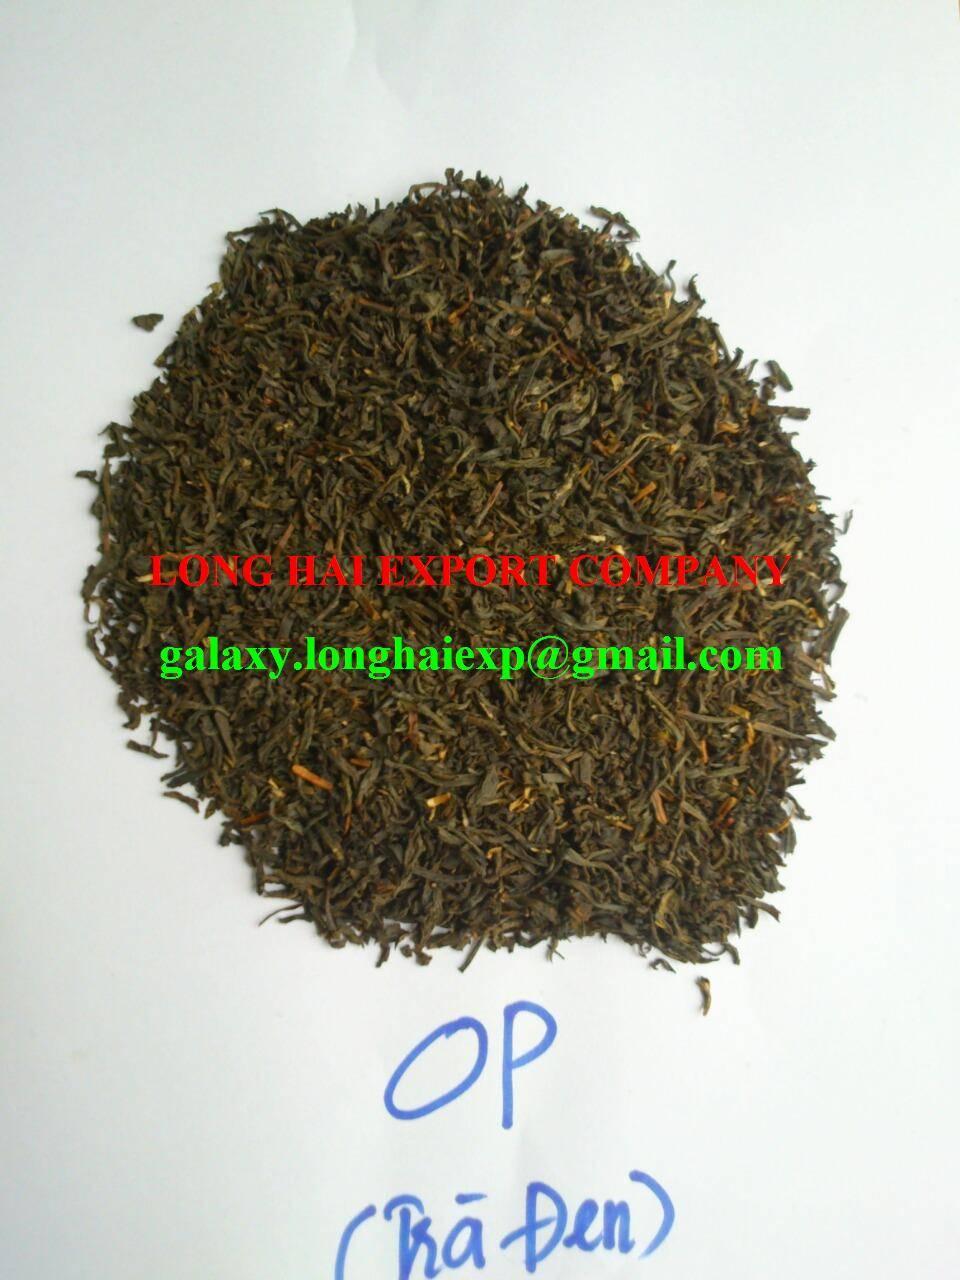 Export Black Tea - High quality